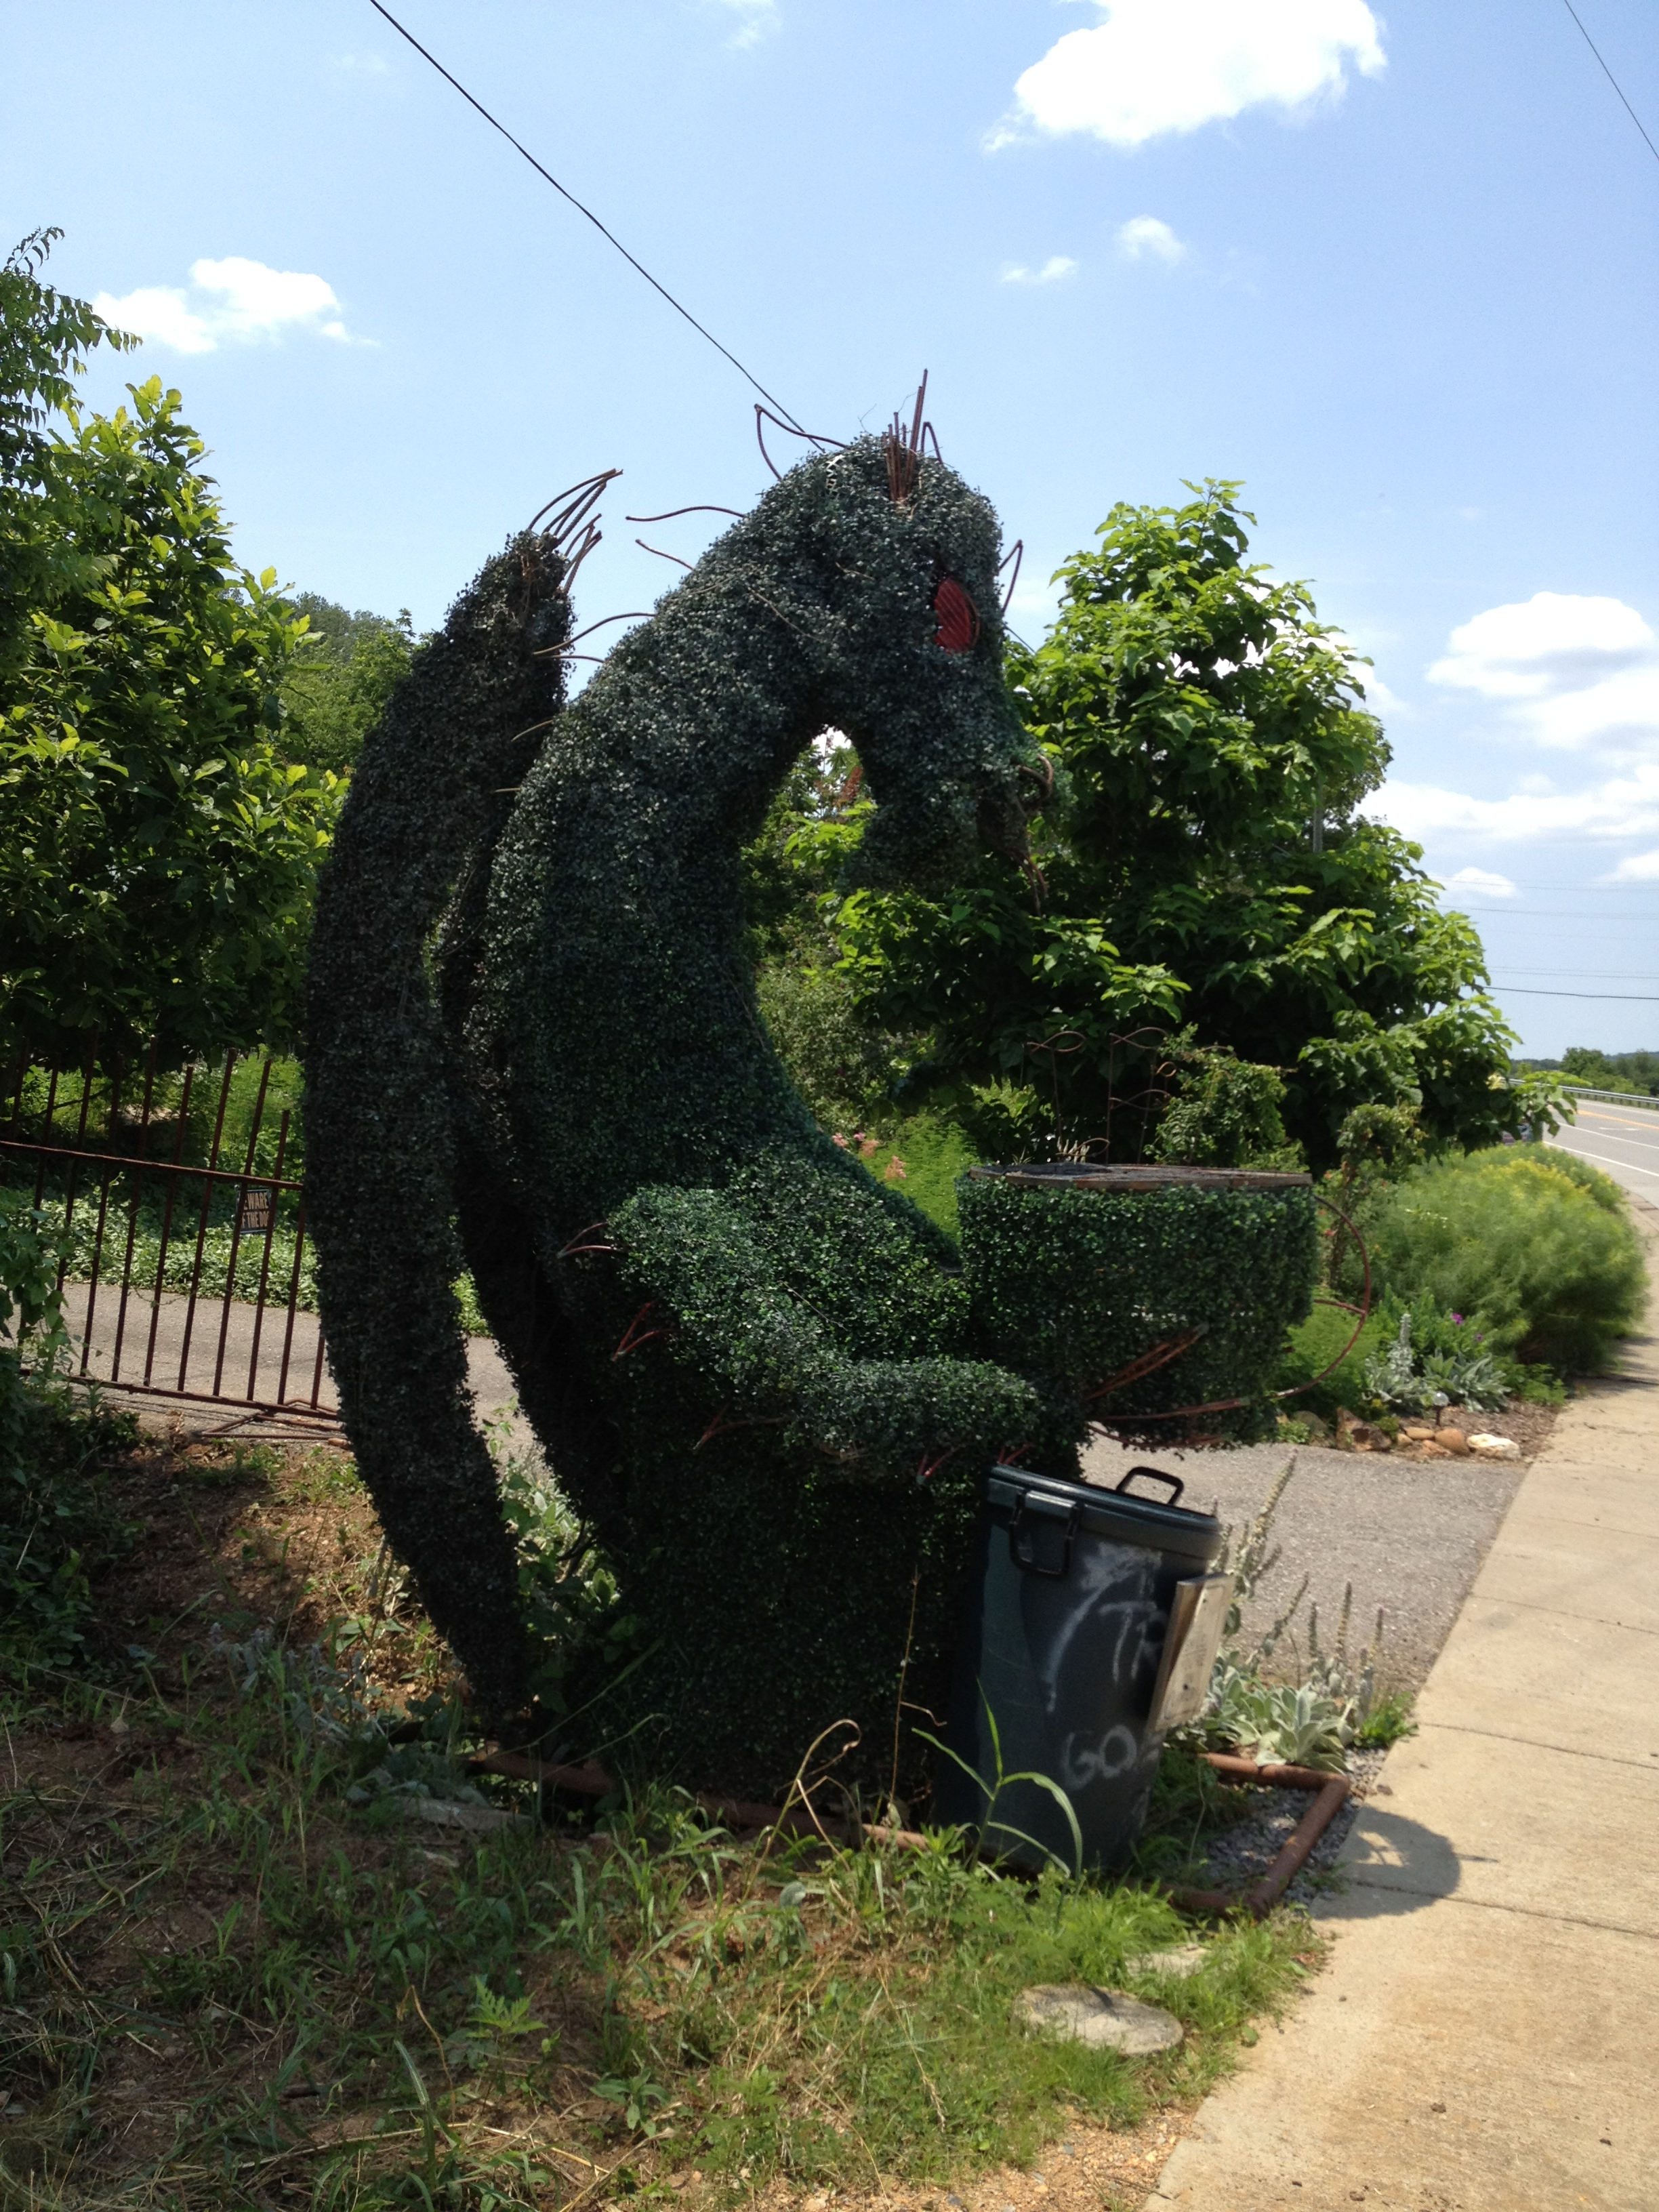 Dragon Bush with a grill